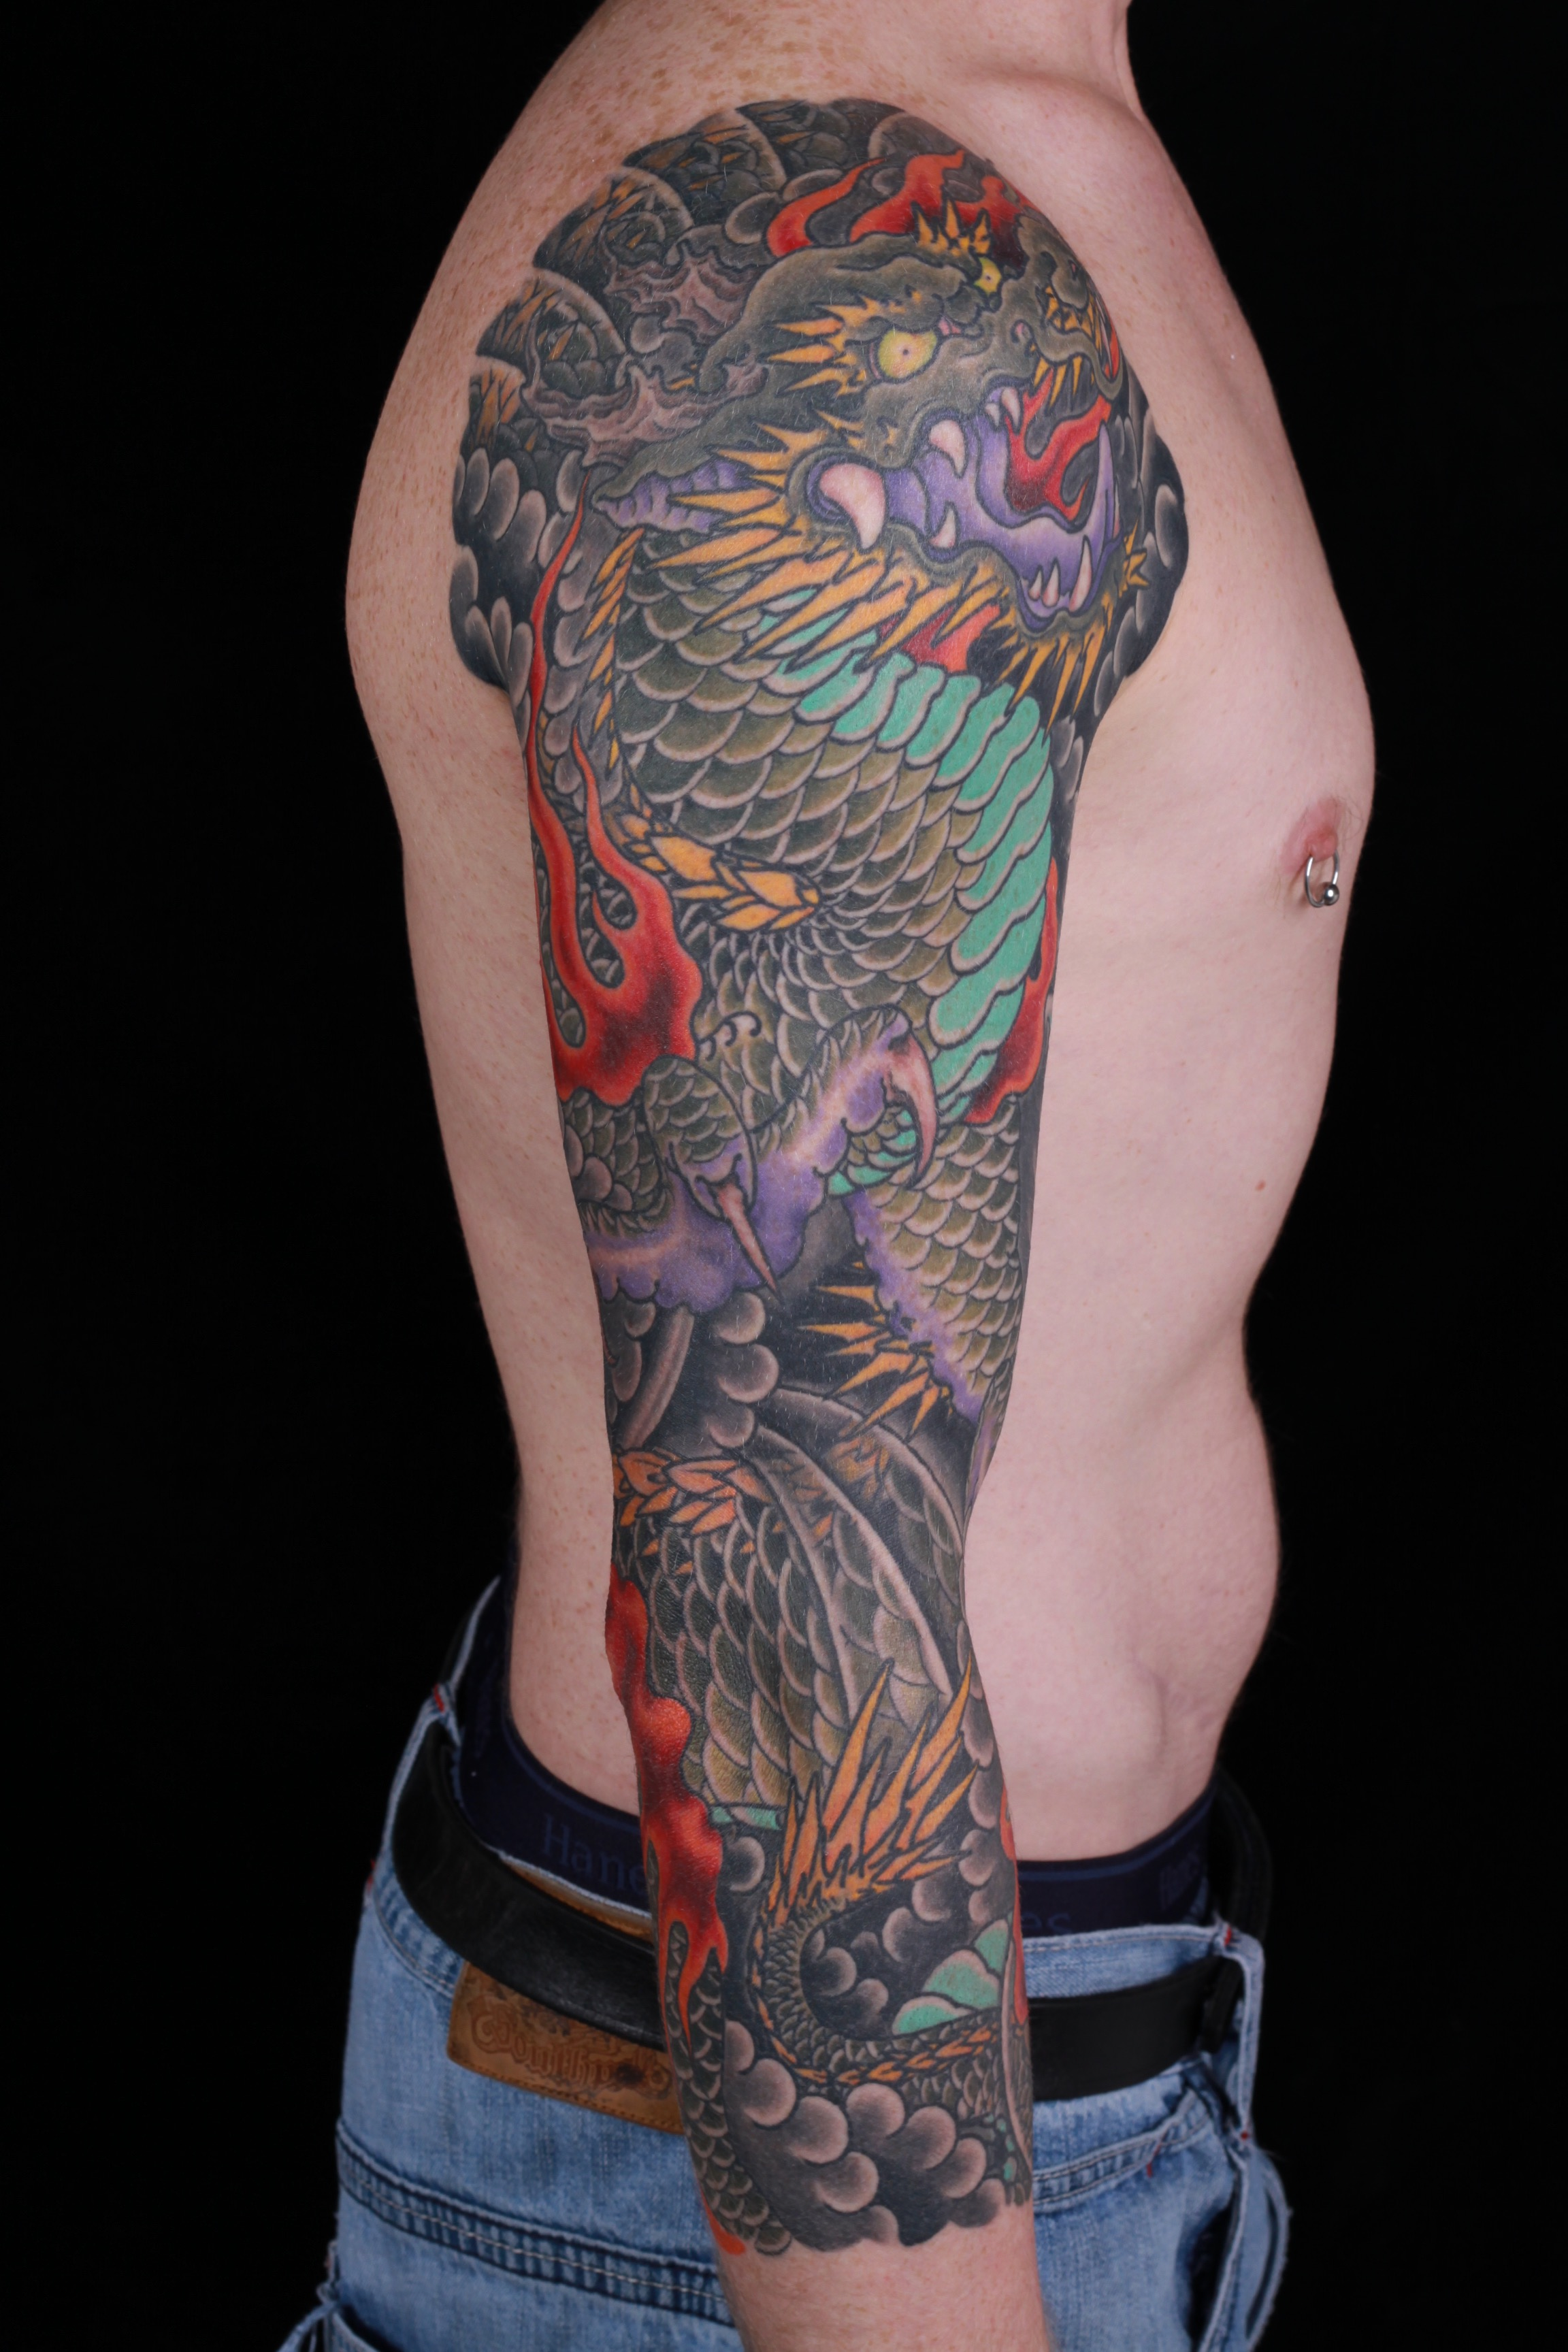 sam-yamini-dedication-tattoo-japanese-dragon-fire-clouds-sleeve-arm